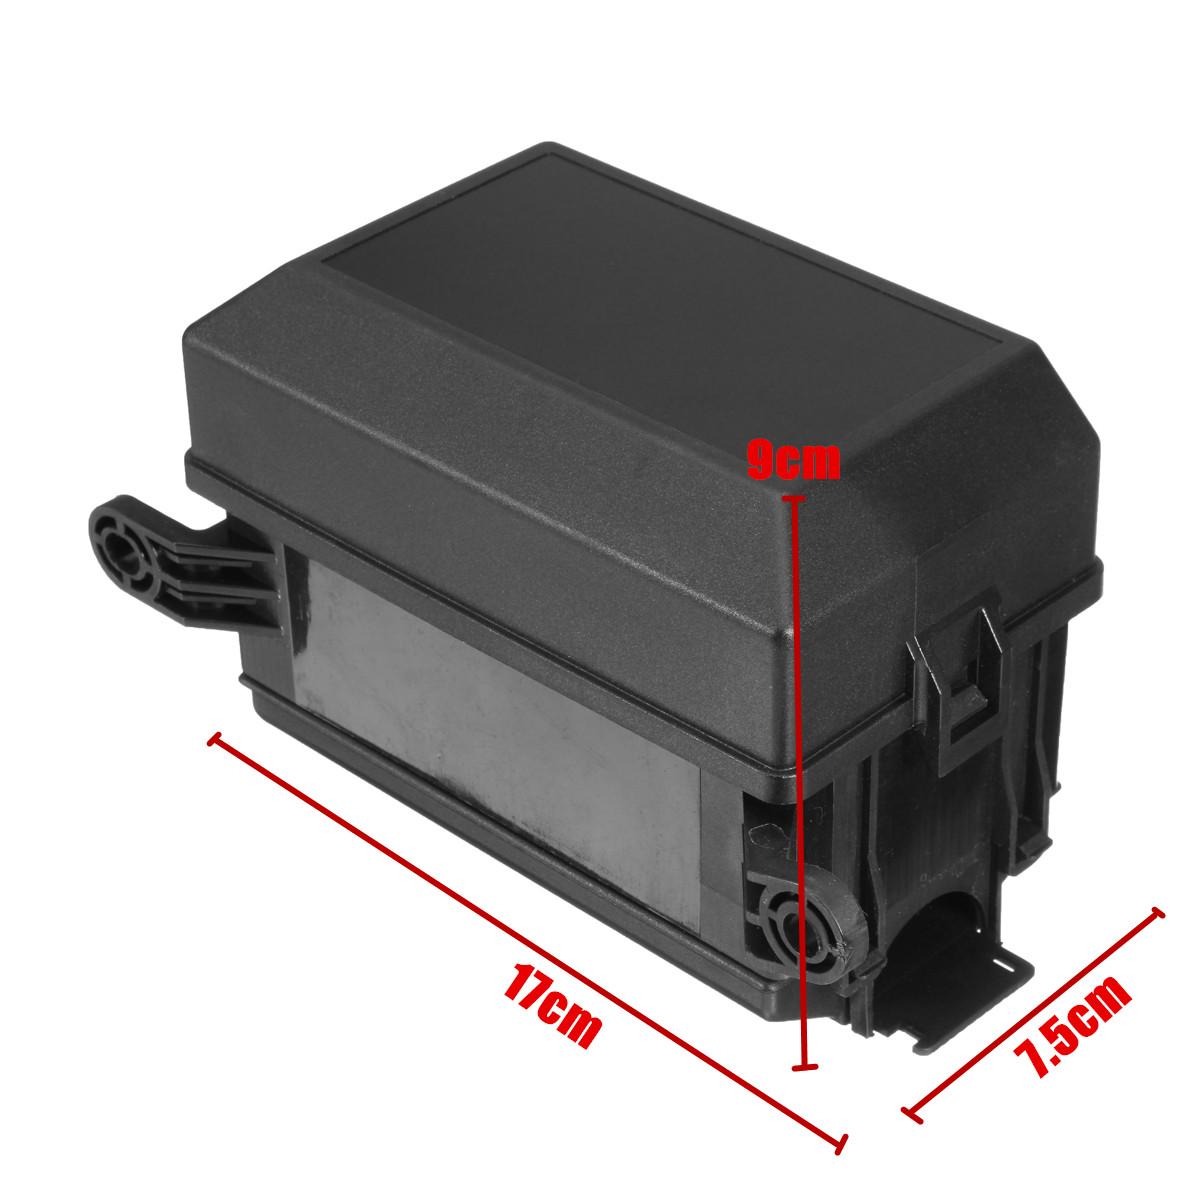 auto car fuse relay holder box socket 6 relay 6 atc ato fuses nacelle insurance 8118278227639 ebay. Black Bedroom Furniture Sets. Home Design Ideas